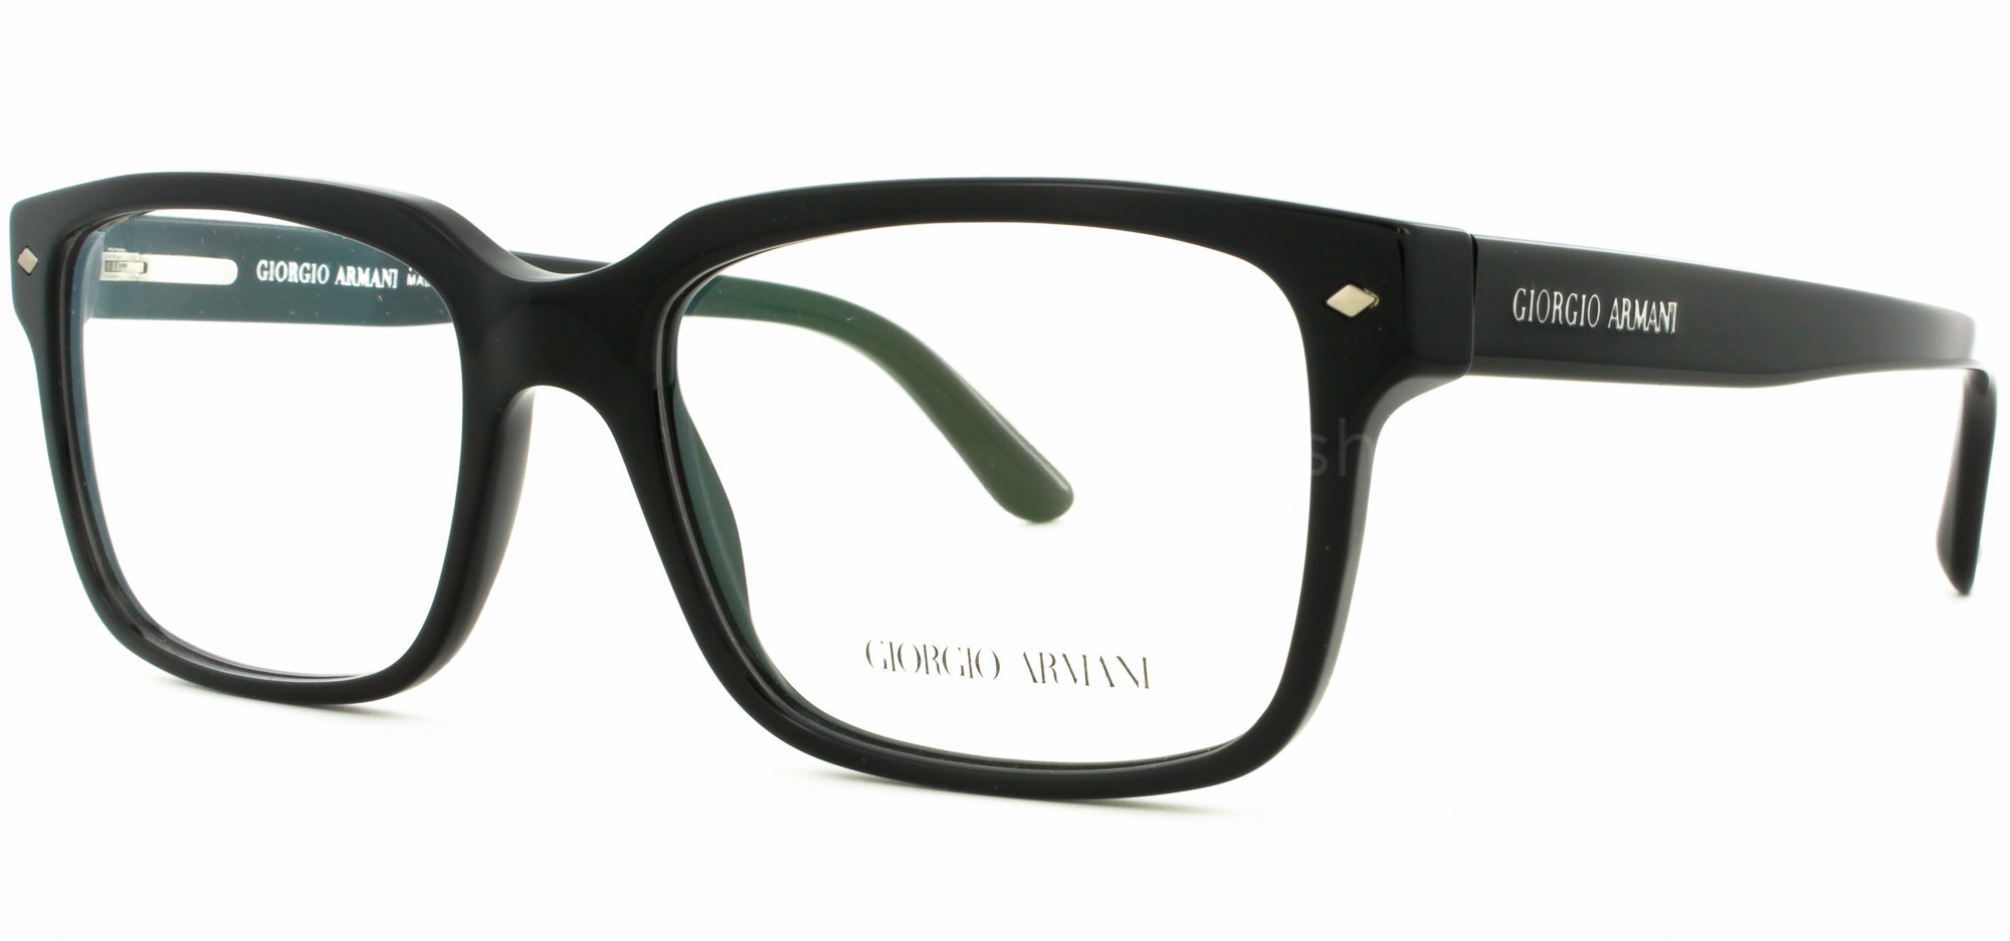 ab741e9399 Buy Giorgio Armani Eyeglasses directly from OpticsFast.com